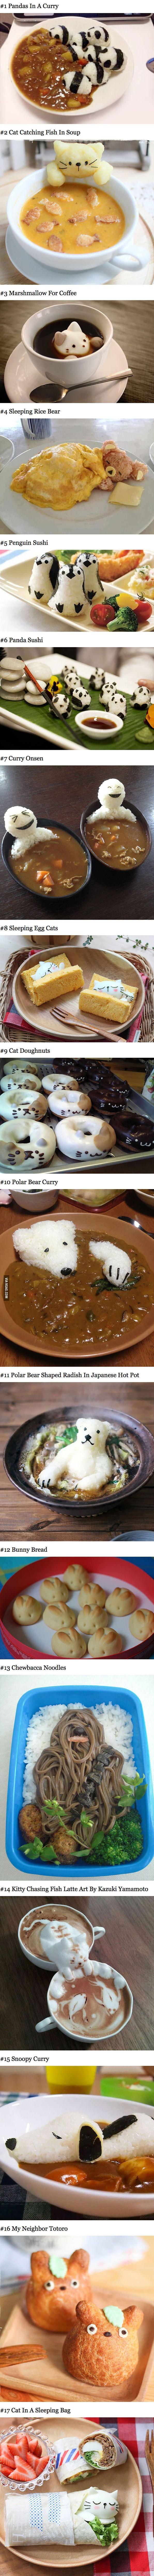 Could you eat this at a restaurant?   Source FacebookGoogleTwitterPinterestEmailStumbleUponRedditTumblrComments comments